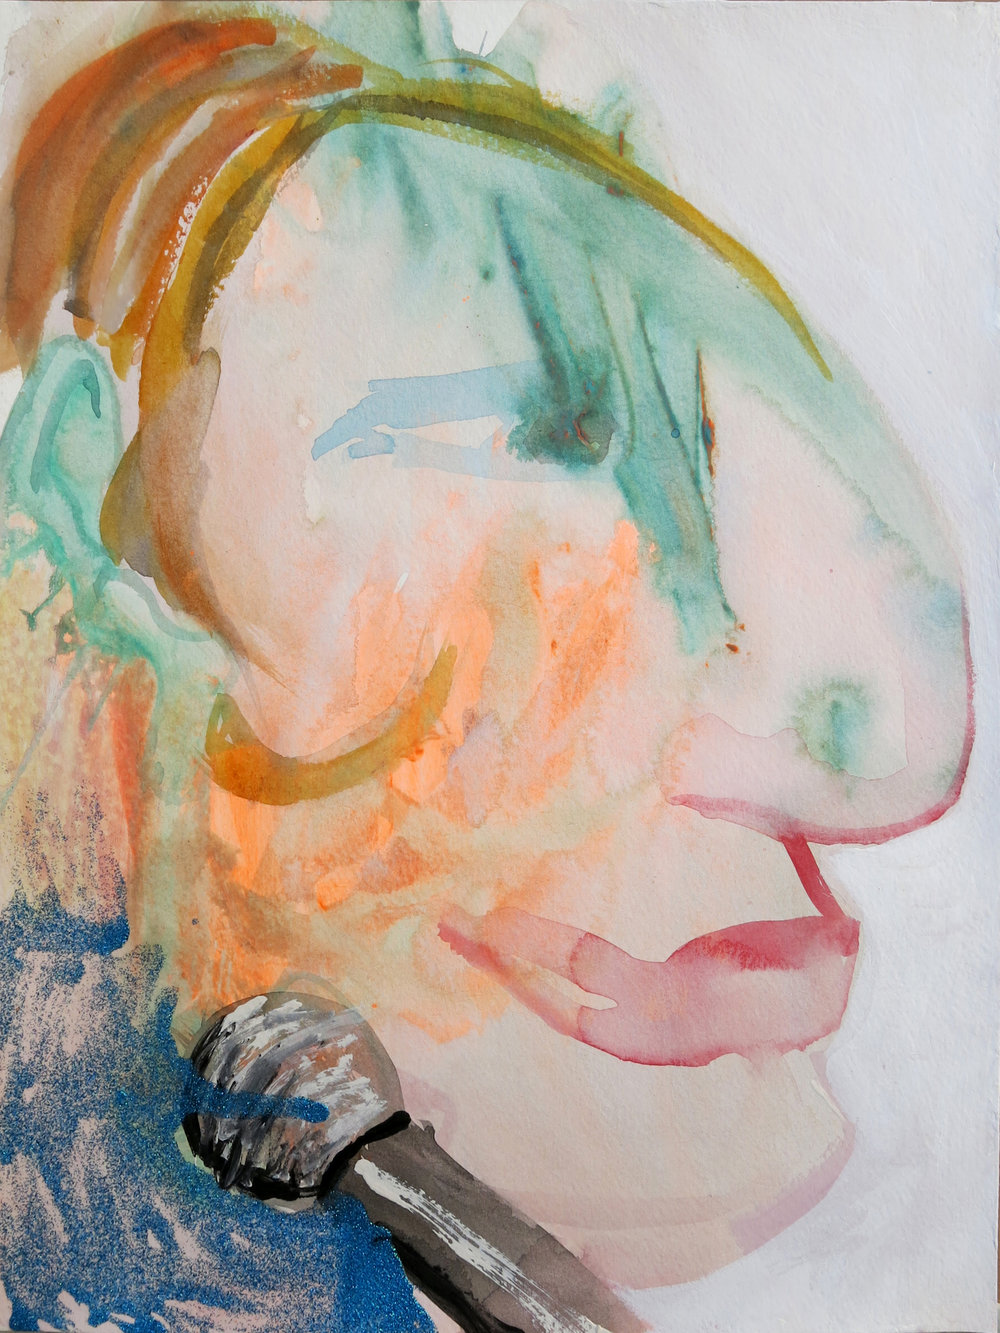 Barbra Streisand Portrait #166